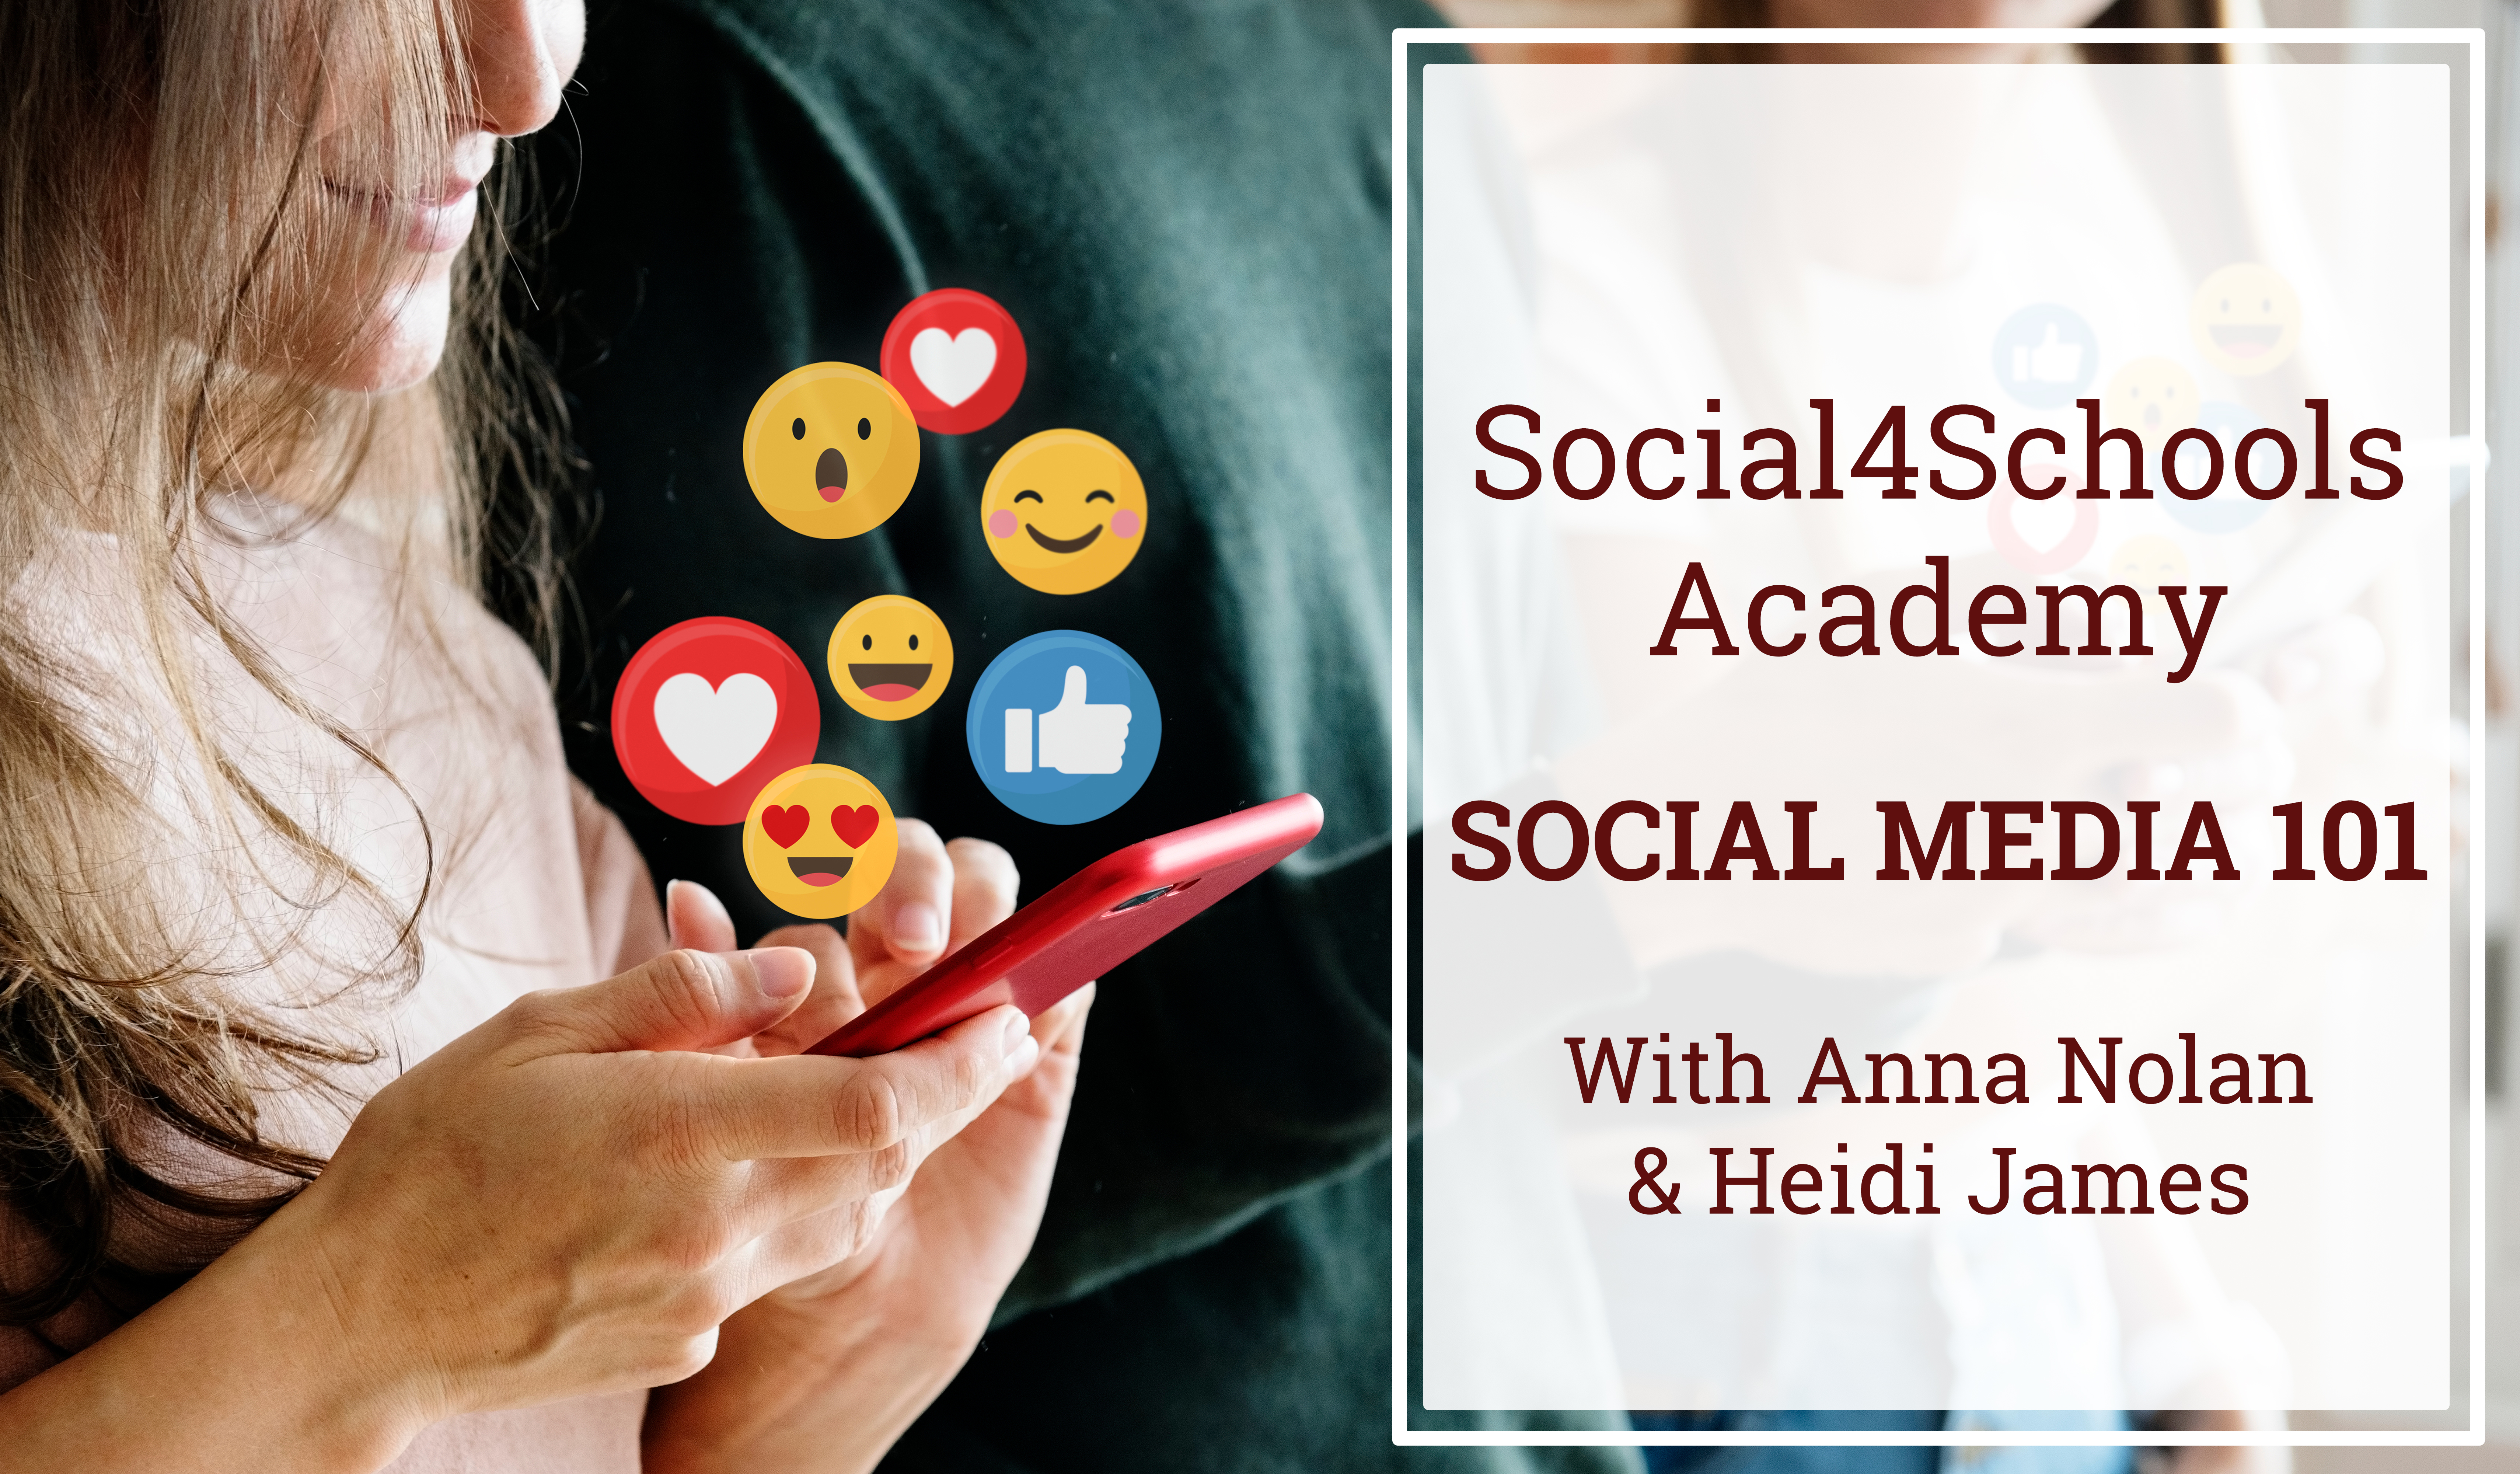 Social4Schools Academy | Social Media 101 with Anna Nolan and Heidi James